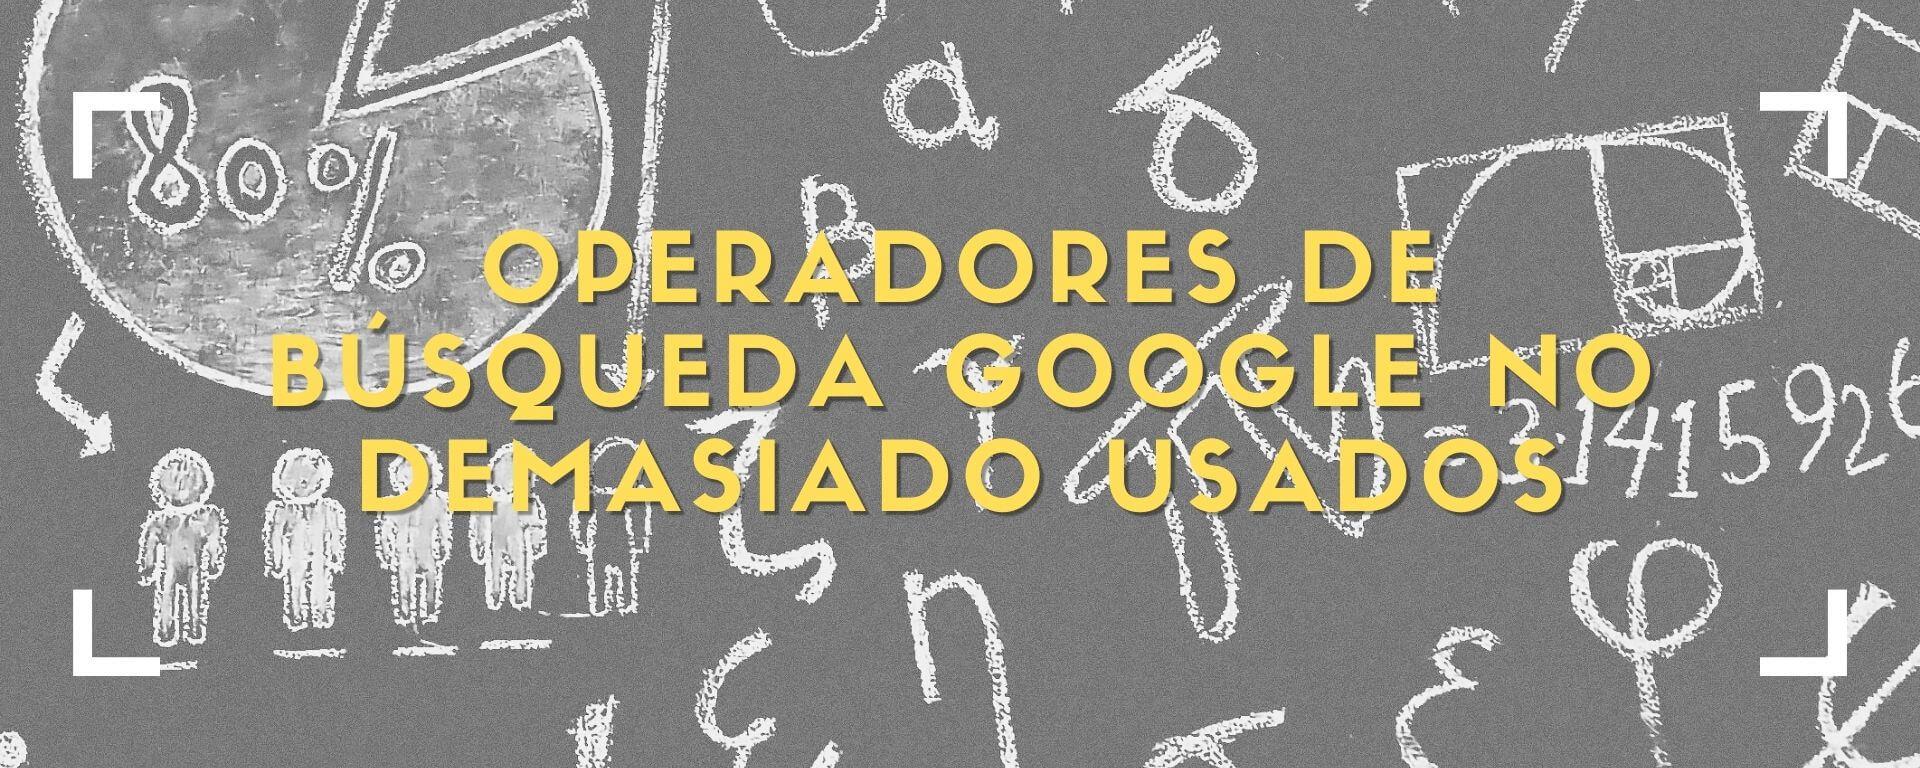 operadores Google